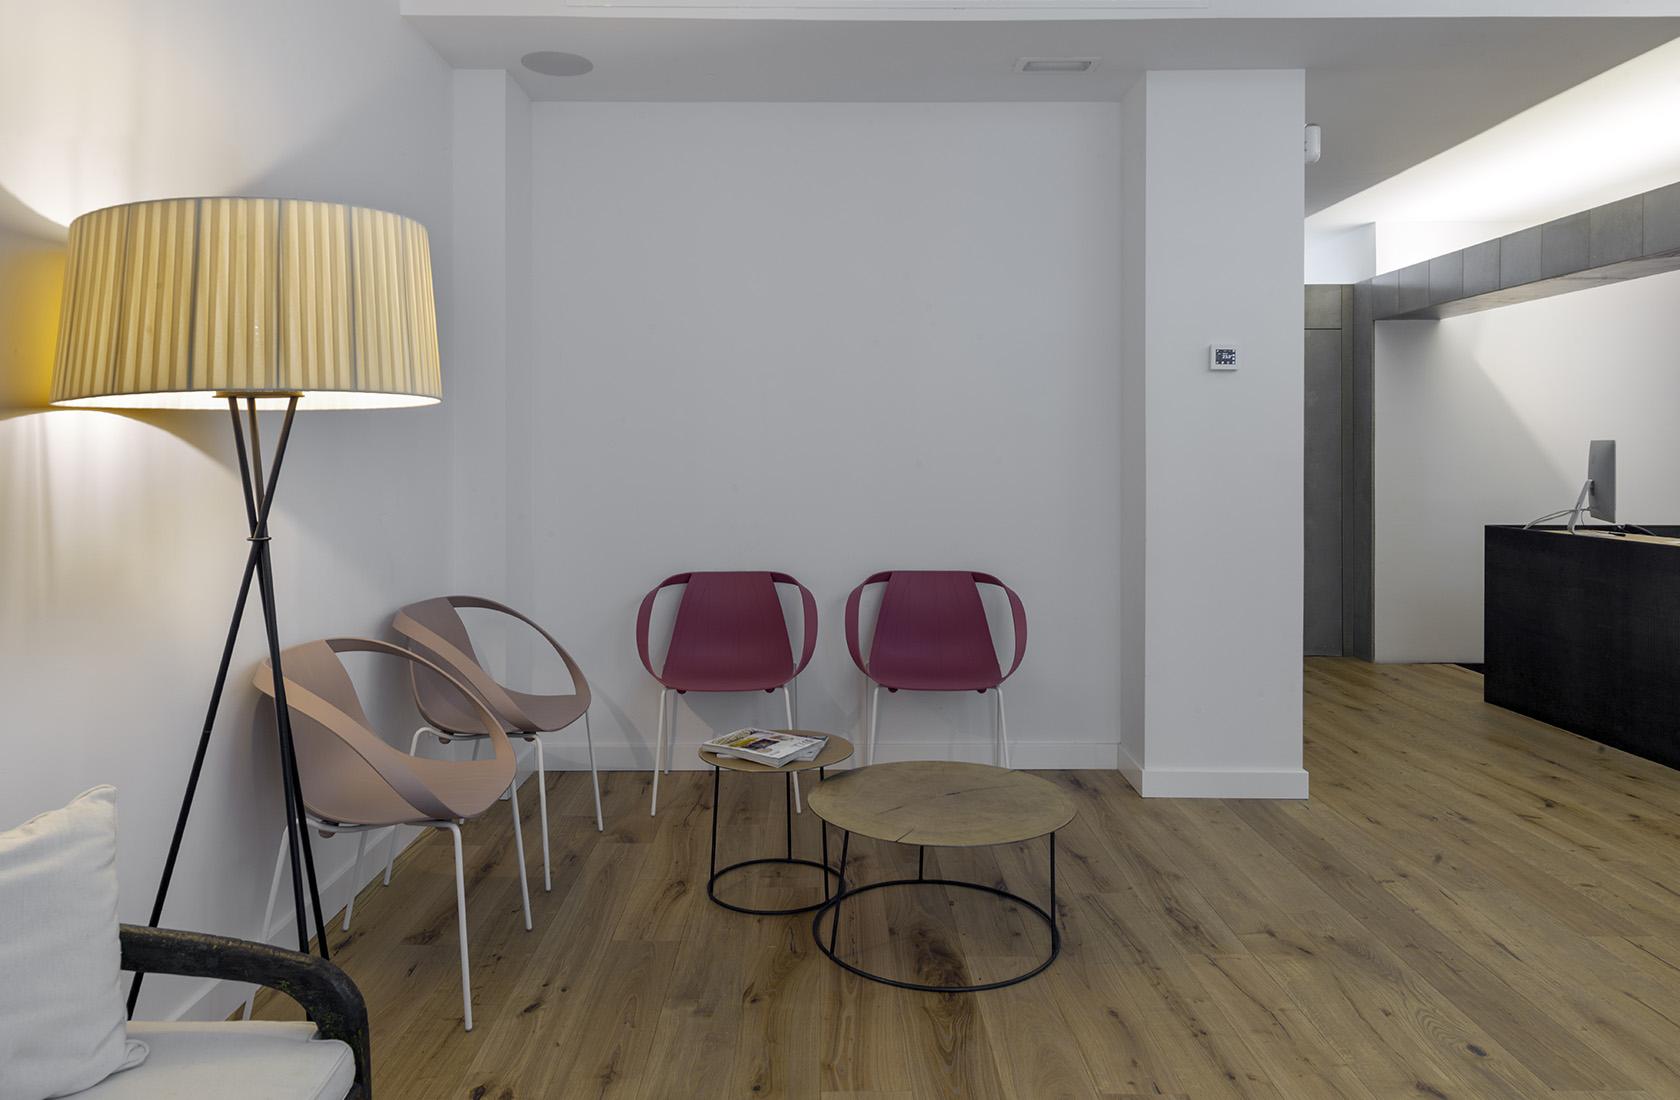 Sala de espera reformada, Clínica Dental González-Solano